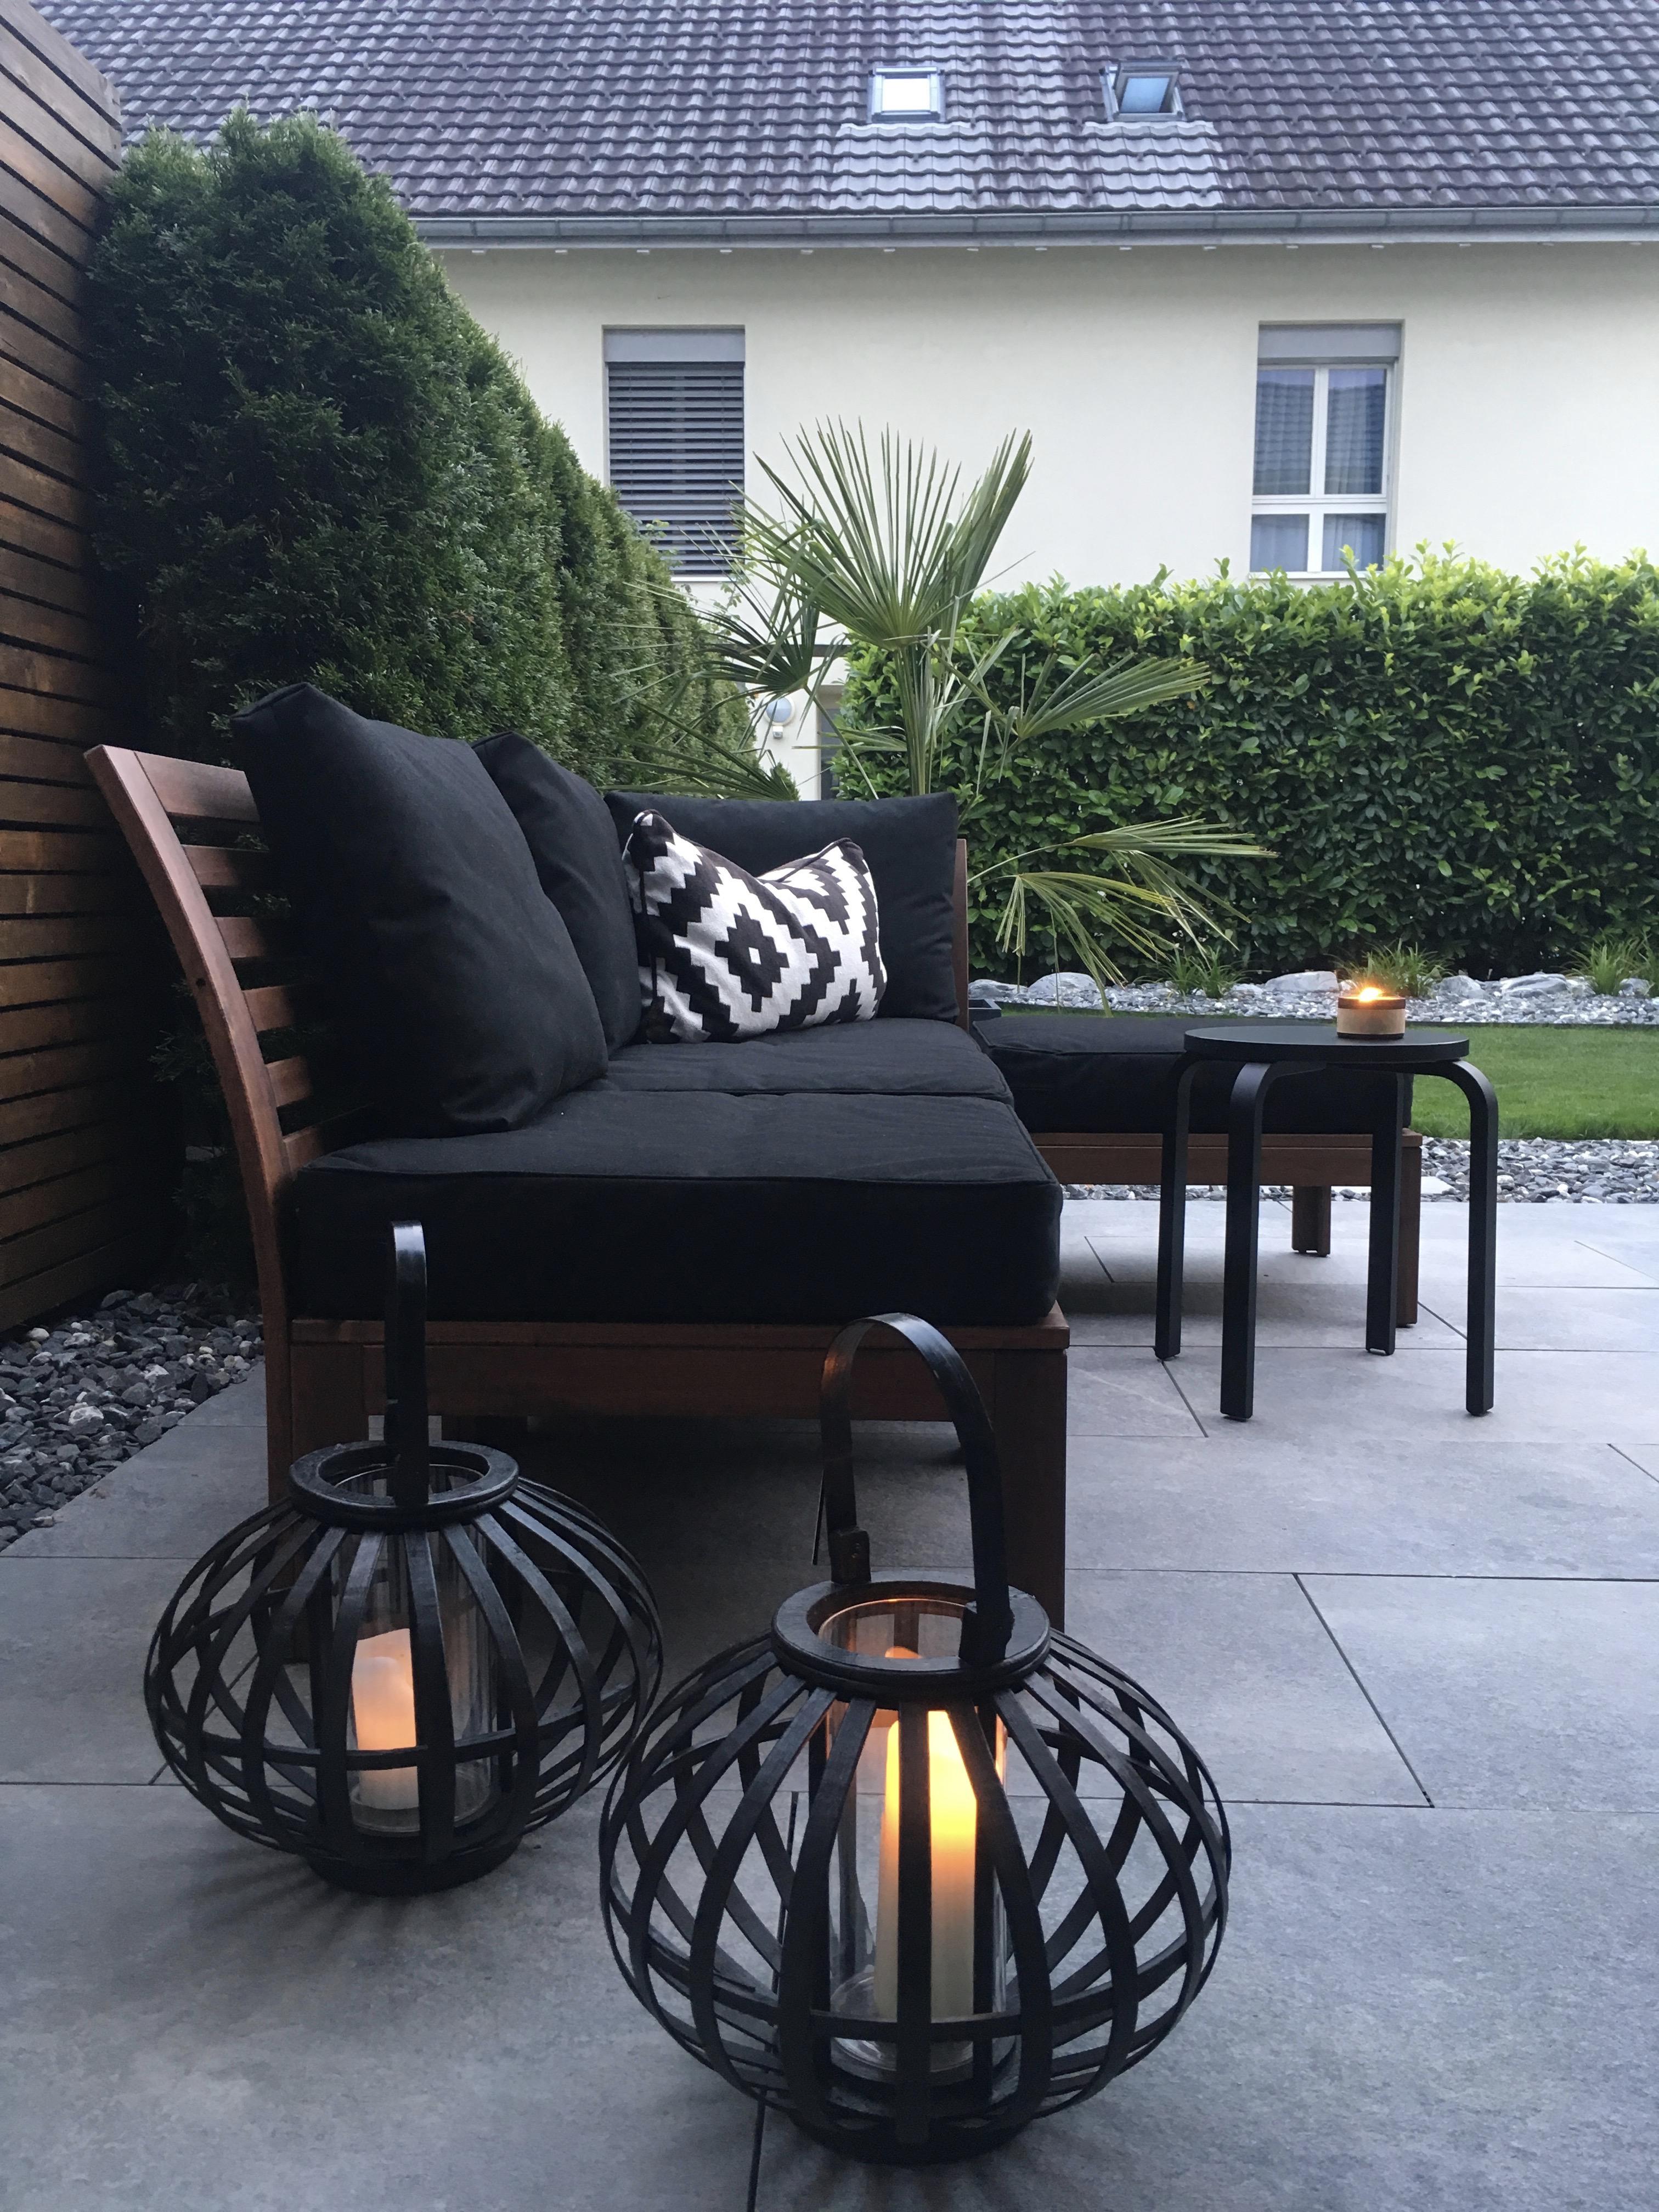 freiraum7 interior design z rich blog. Black Bedroom Furniture Sets. Home Design Ideas